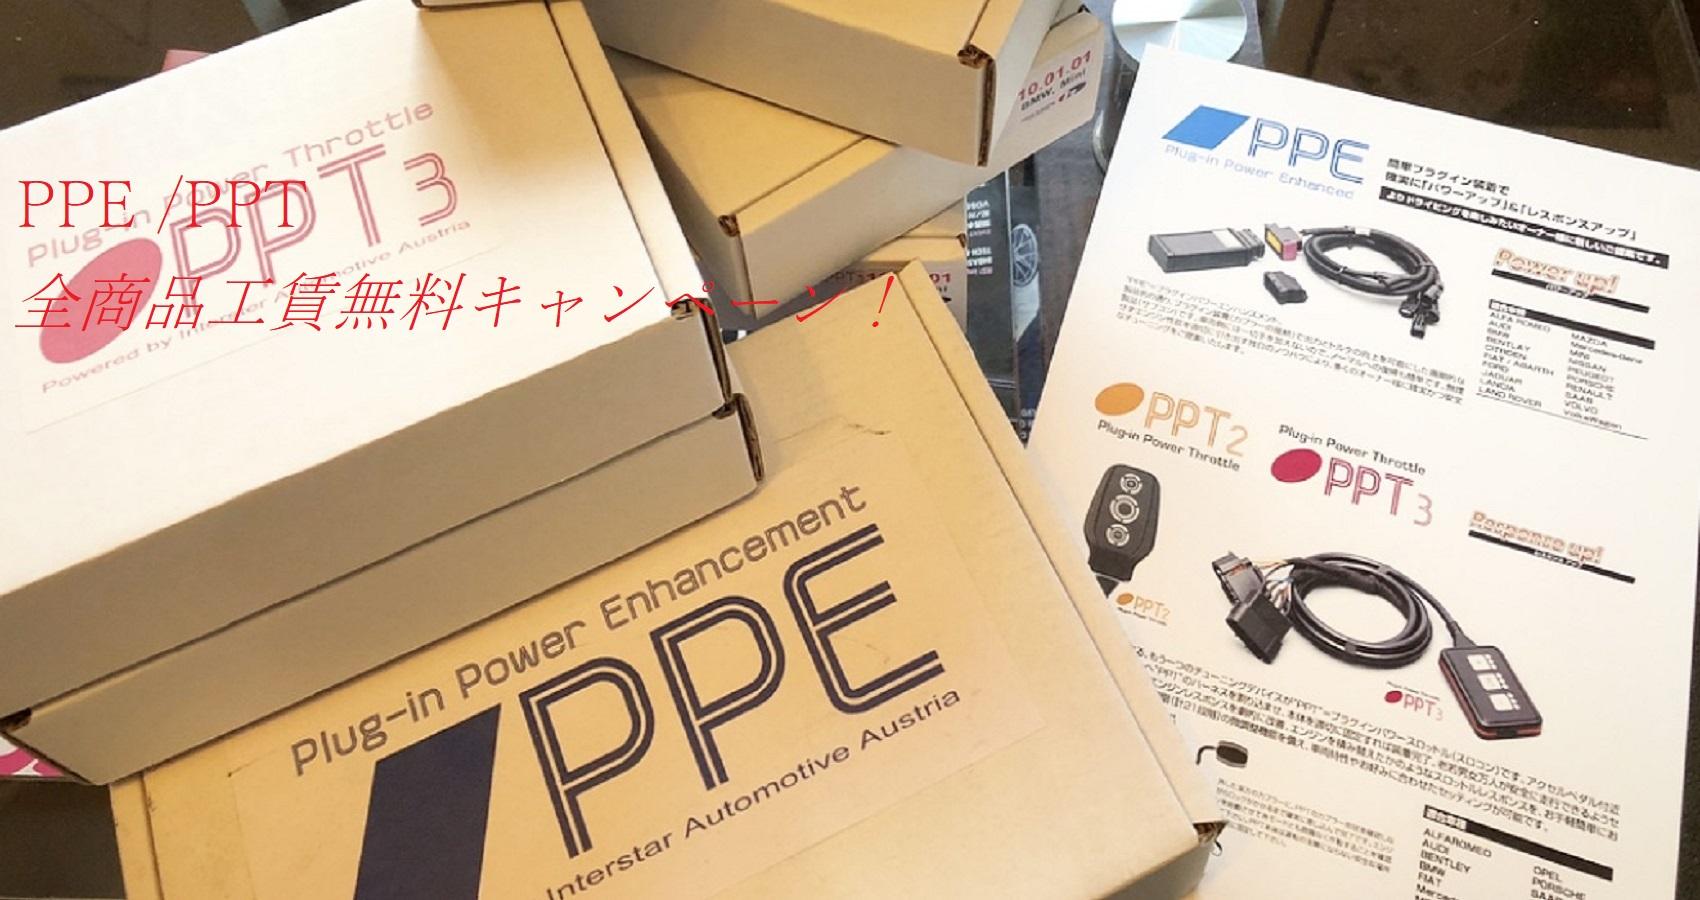 PPE /PPT 全商品工賃無料キャンペーン!